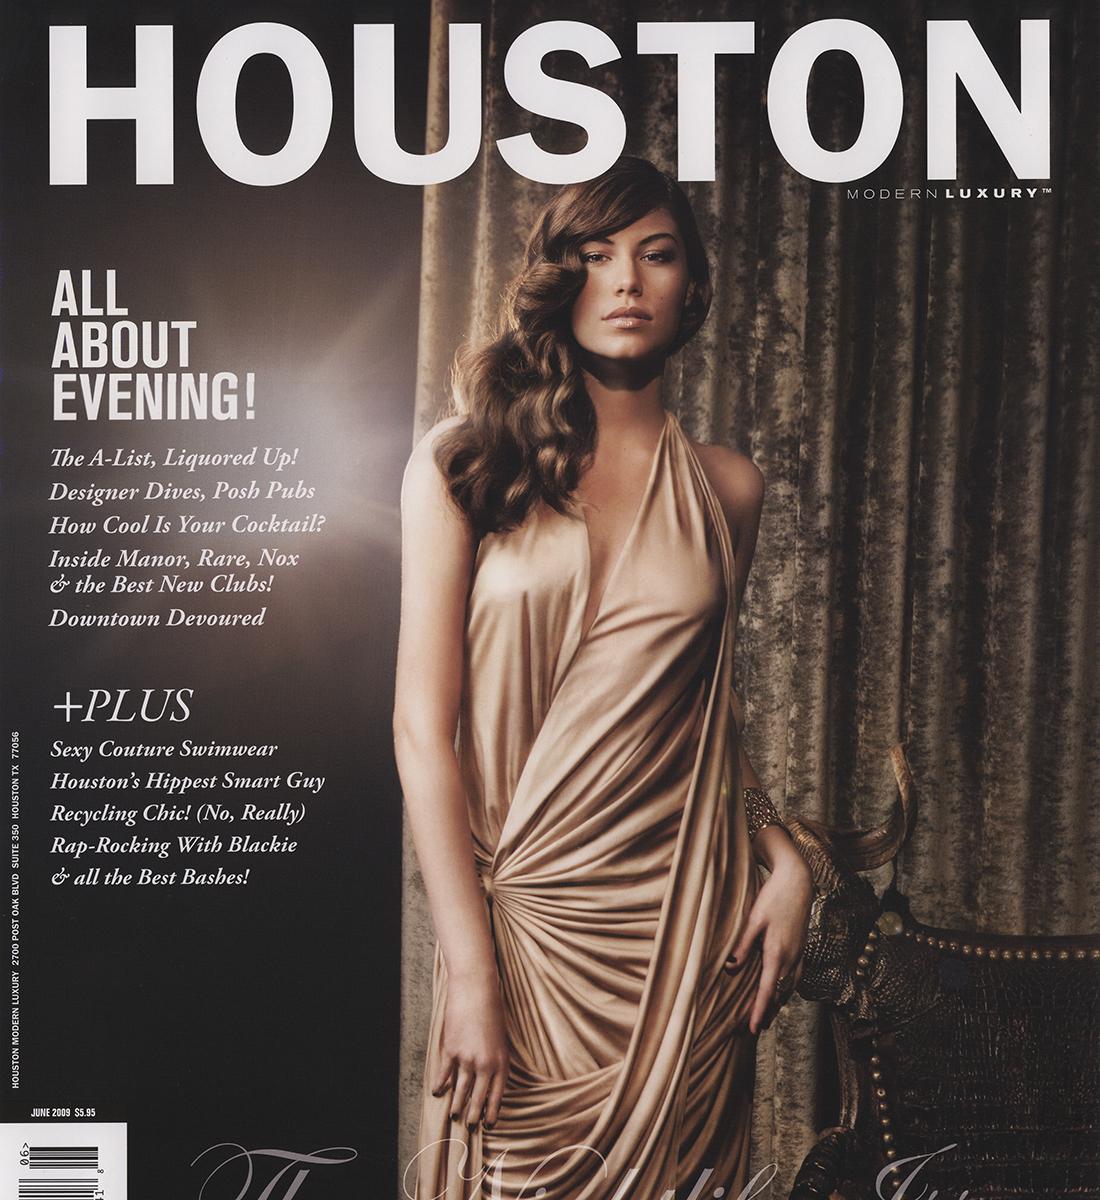 h july cover 2009_1.JPG